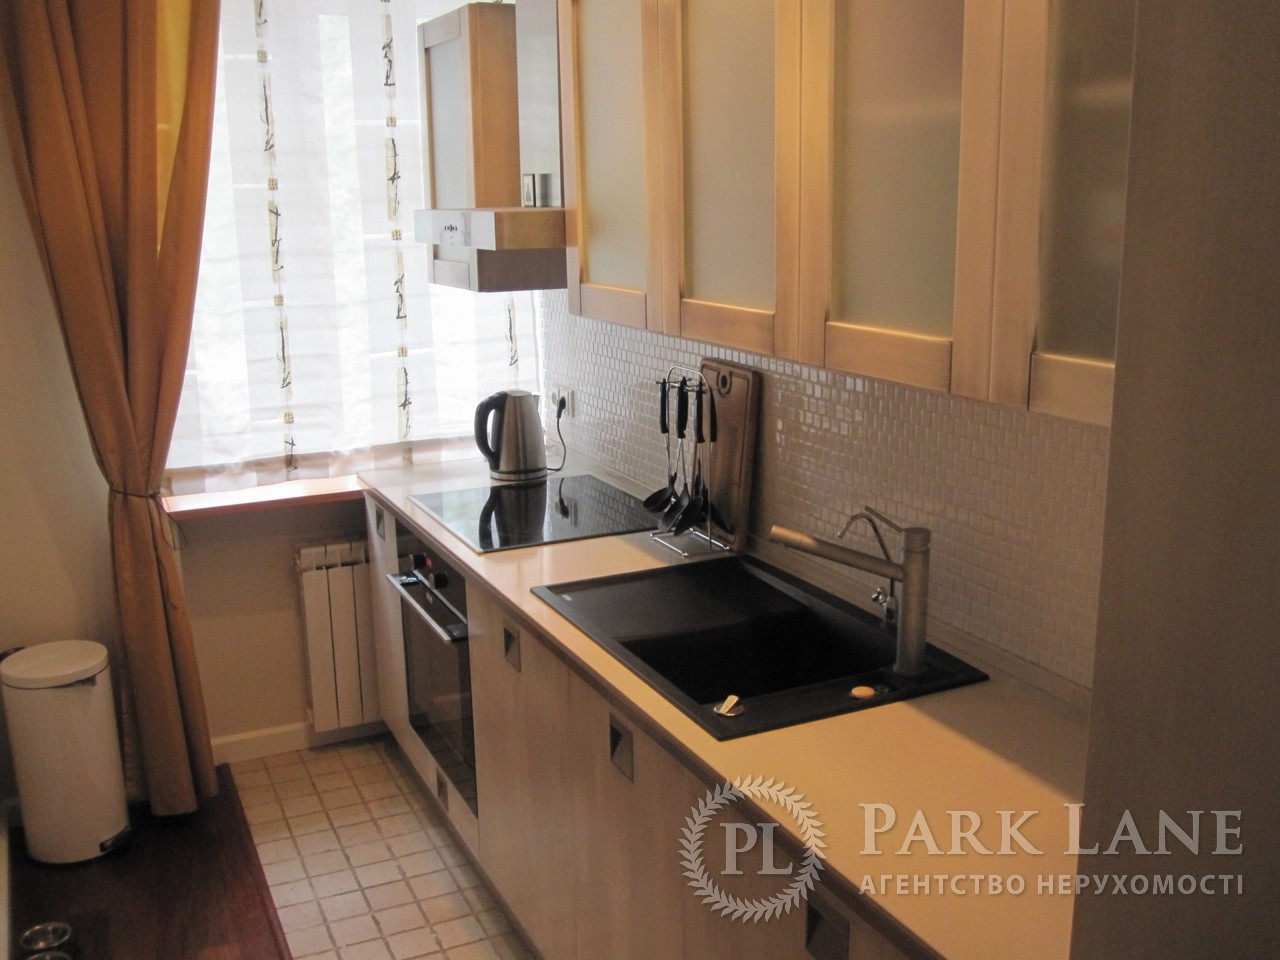 Квартира ул. Городецкого Архитектора, 4, Киев, X-29033 - Фото 13